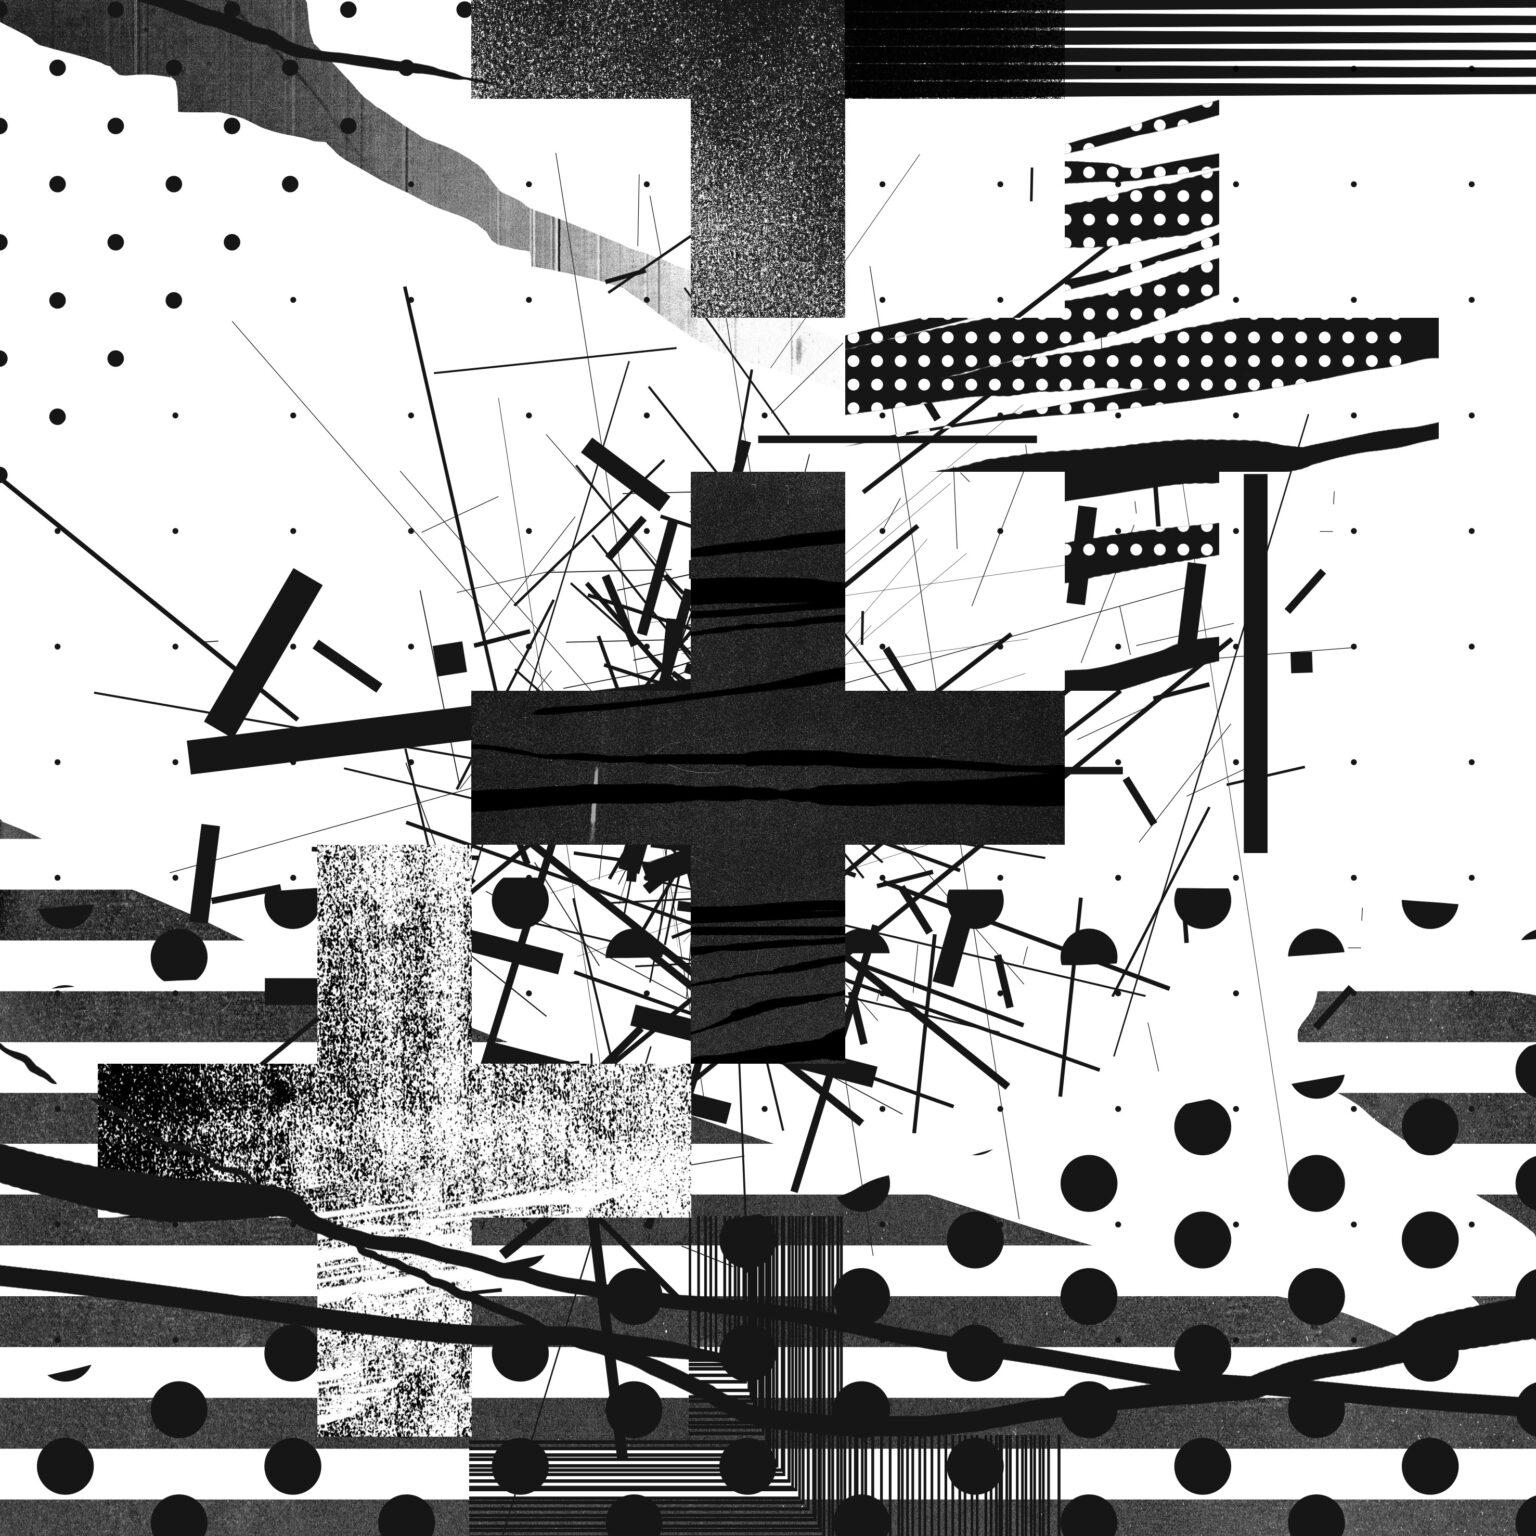 ATC Artist Series Blasto Uno Letter Symbols